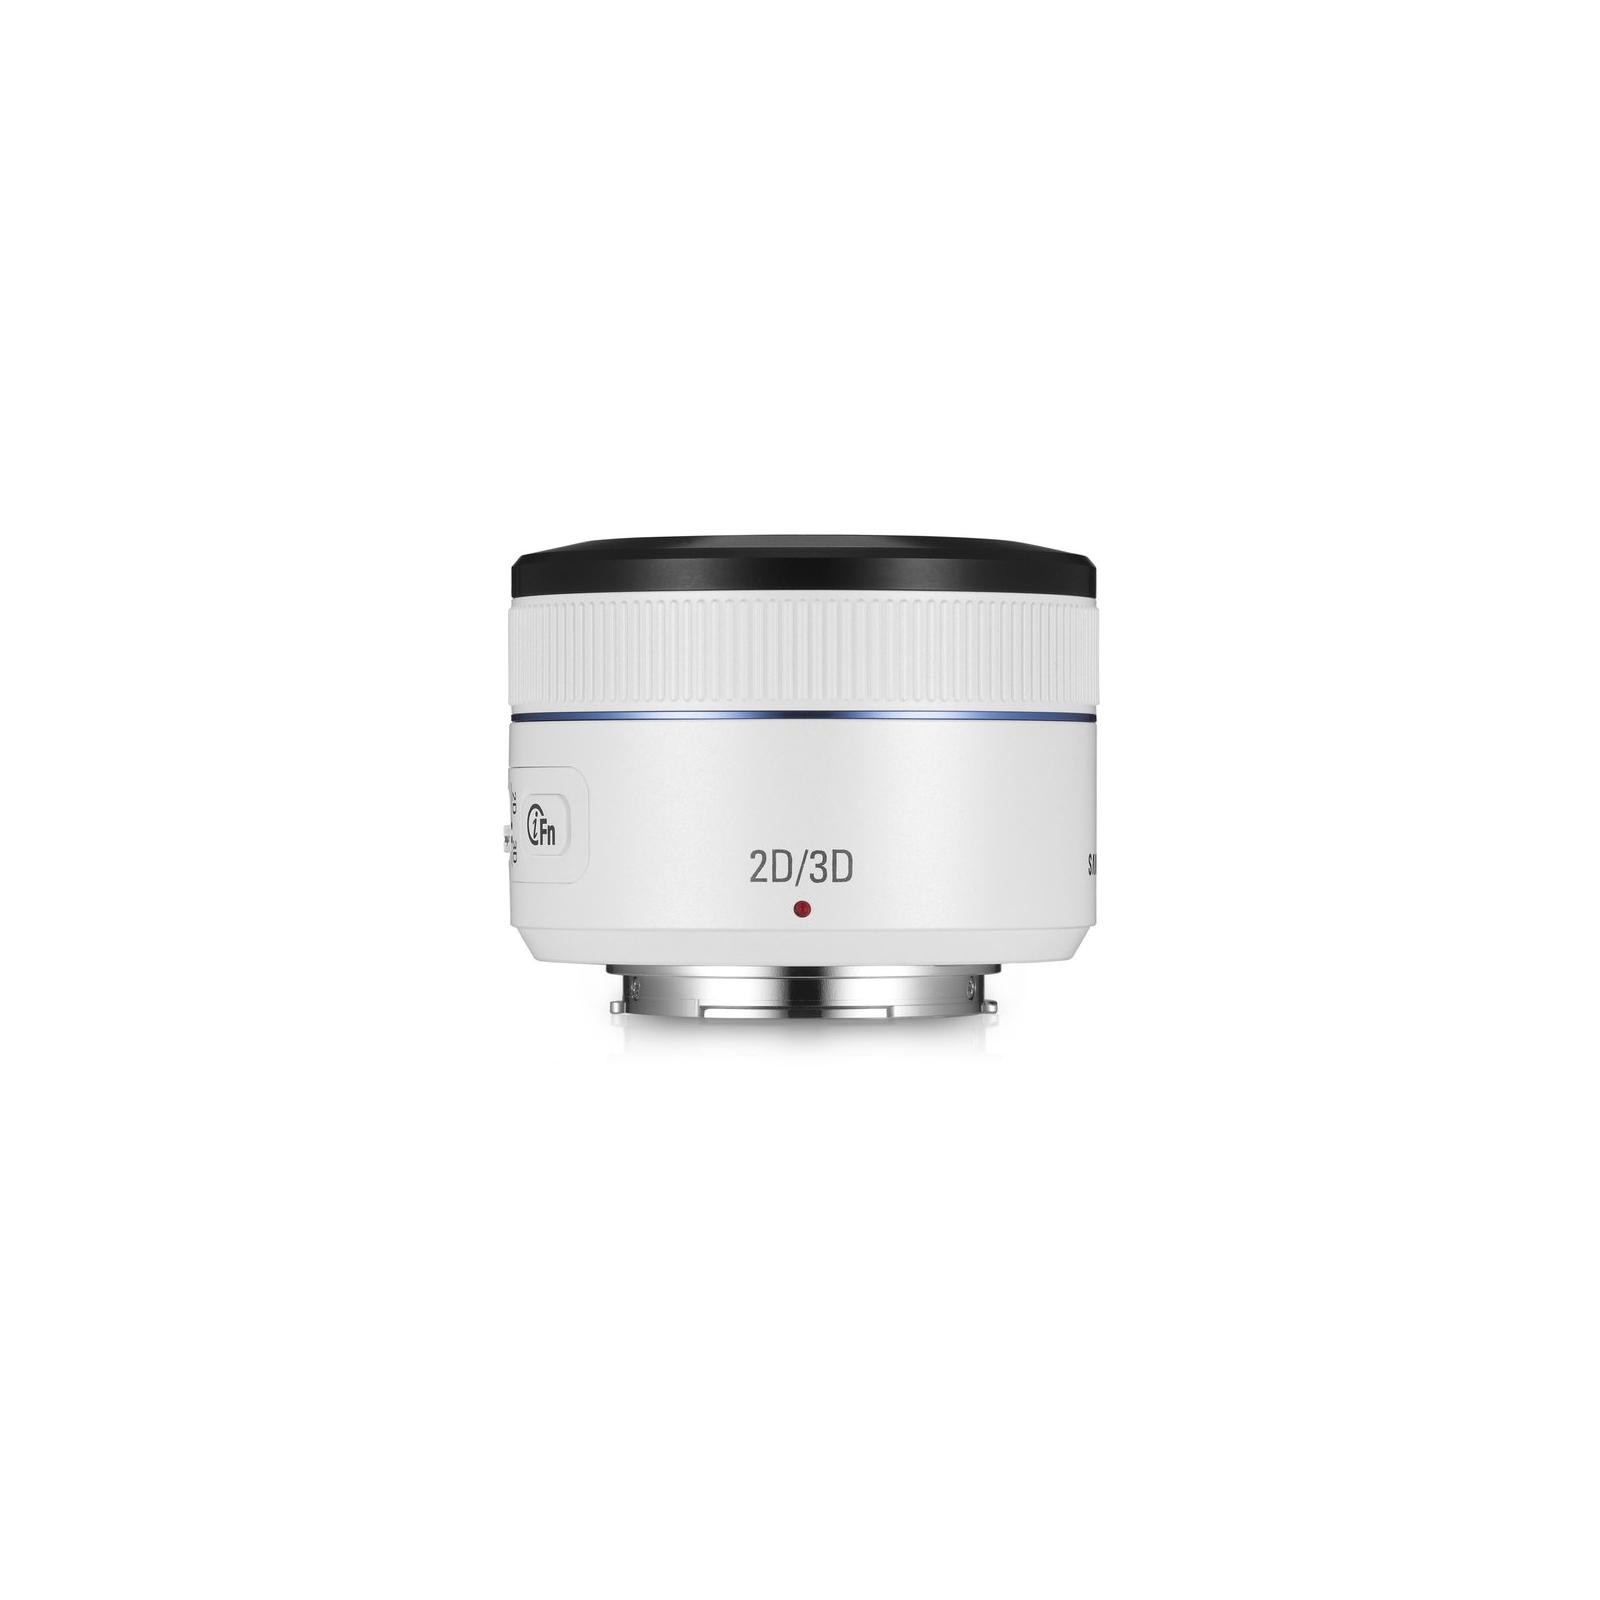 Объектив Samsung EX-S45ADW 45 mm f/1.8 [T6] 2D/3D (EX-S45ADW)